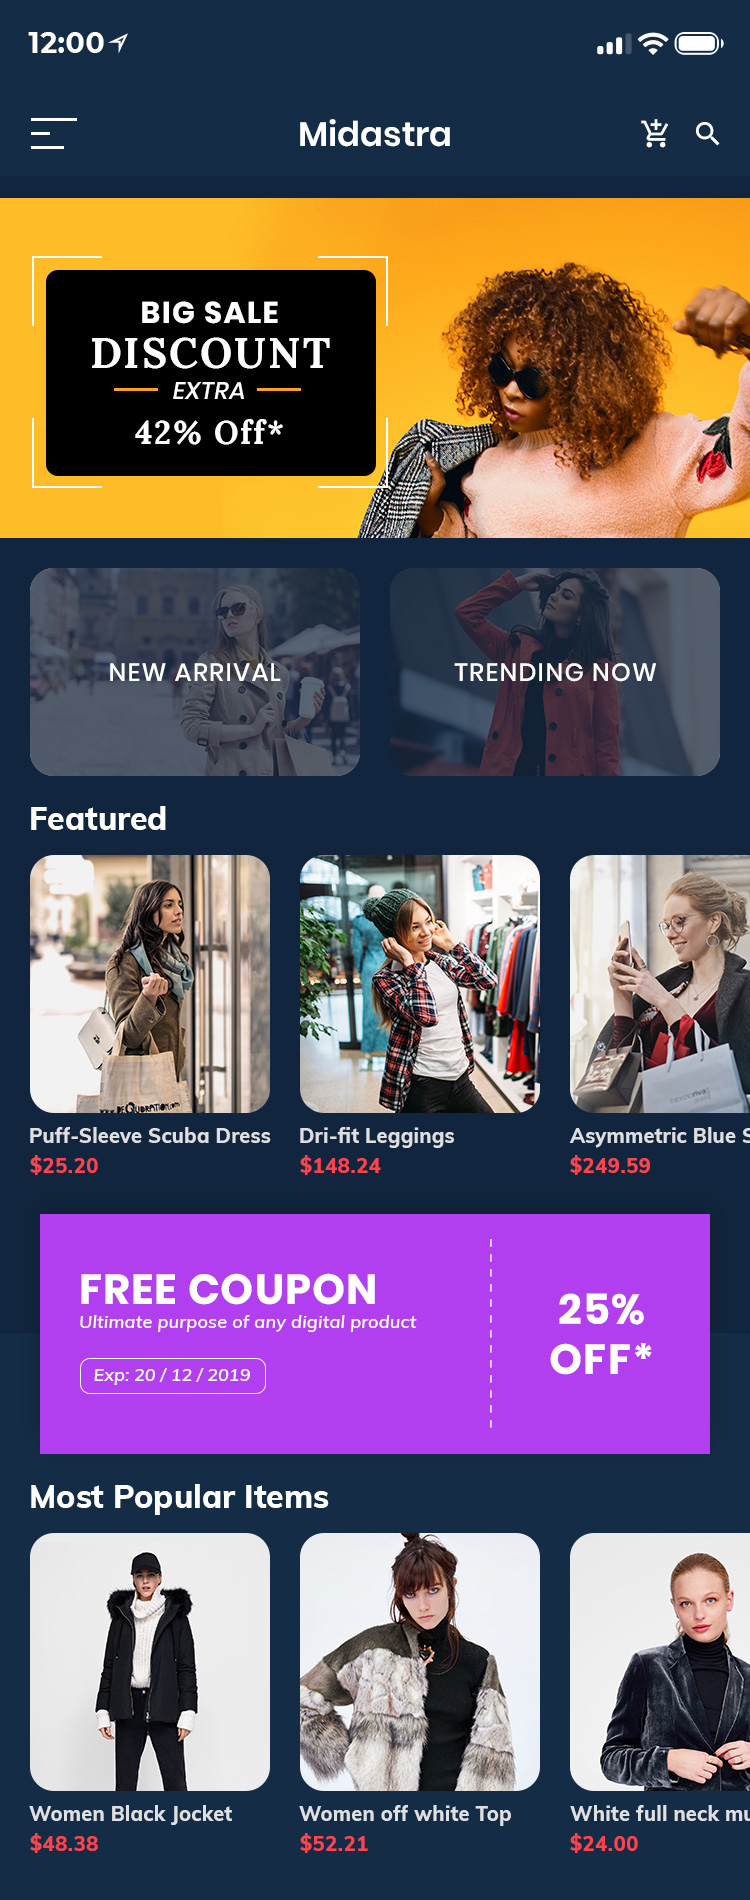 mobile-app-ecommerce-7